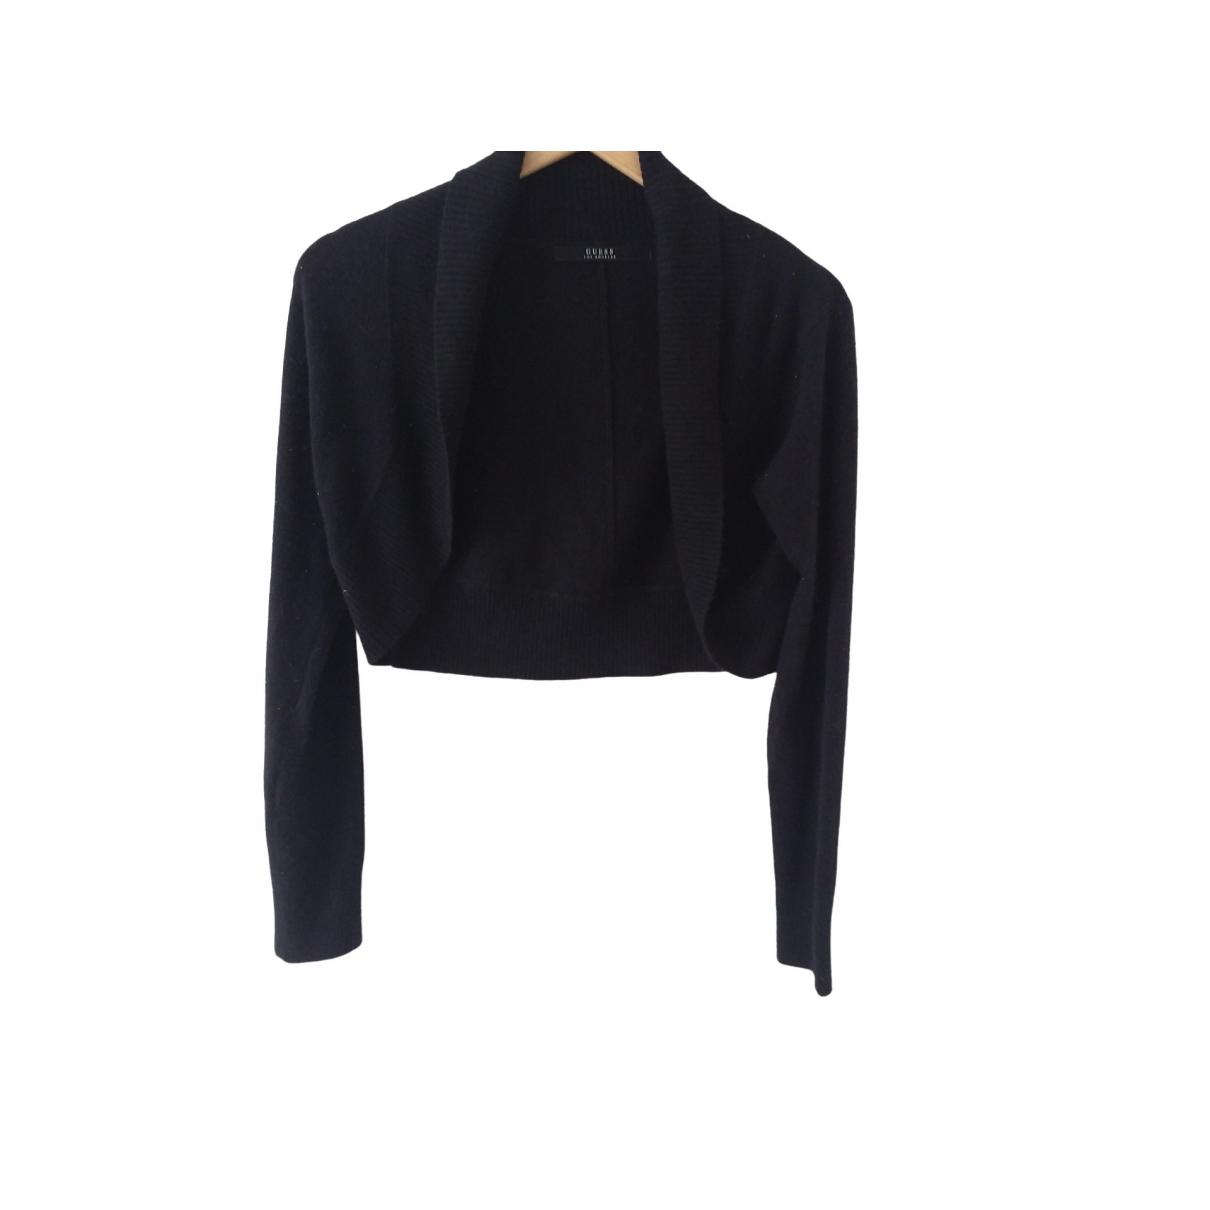 Guess \N Black jacket for Women M International